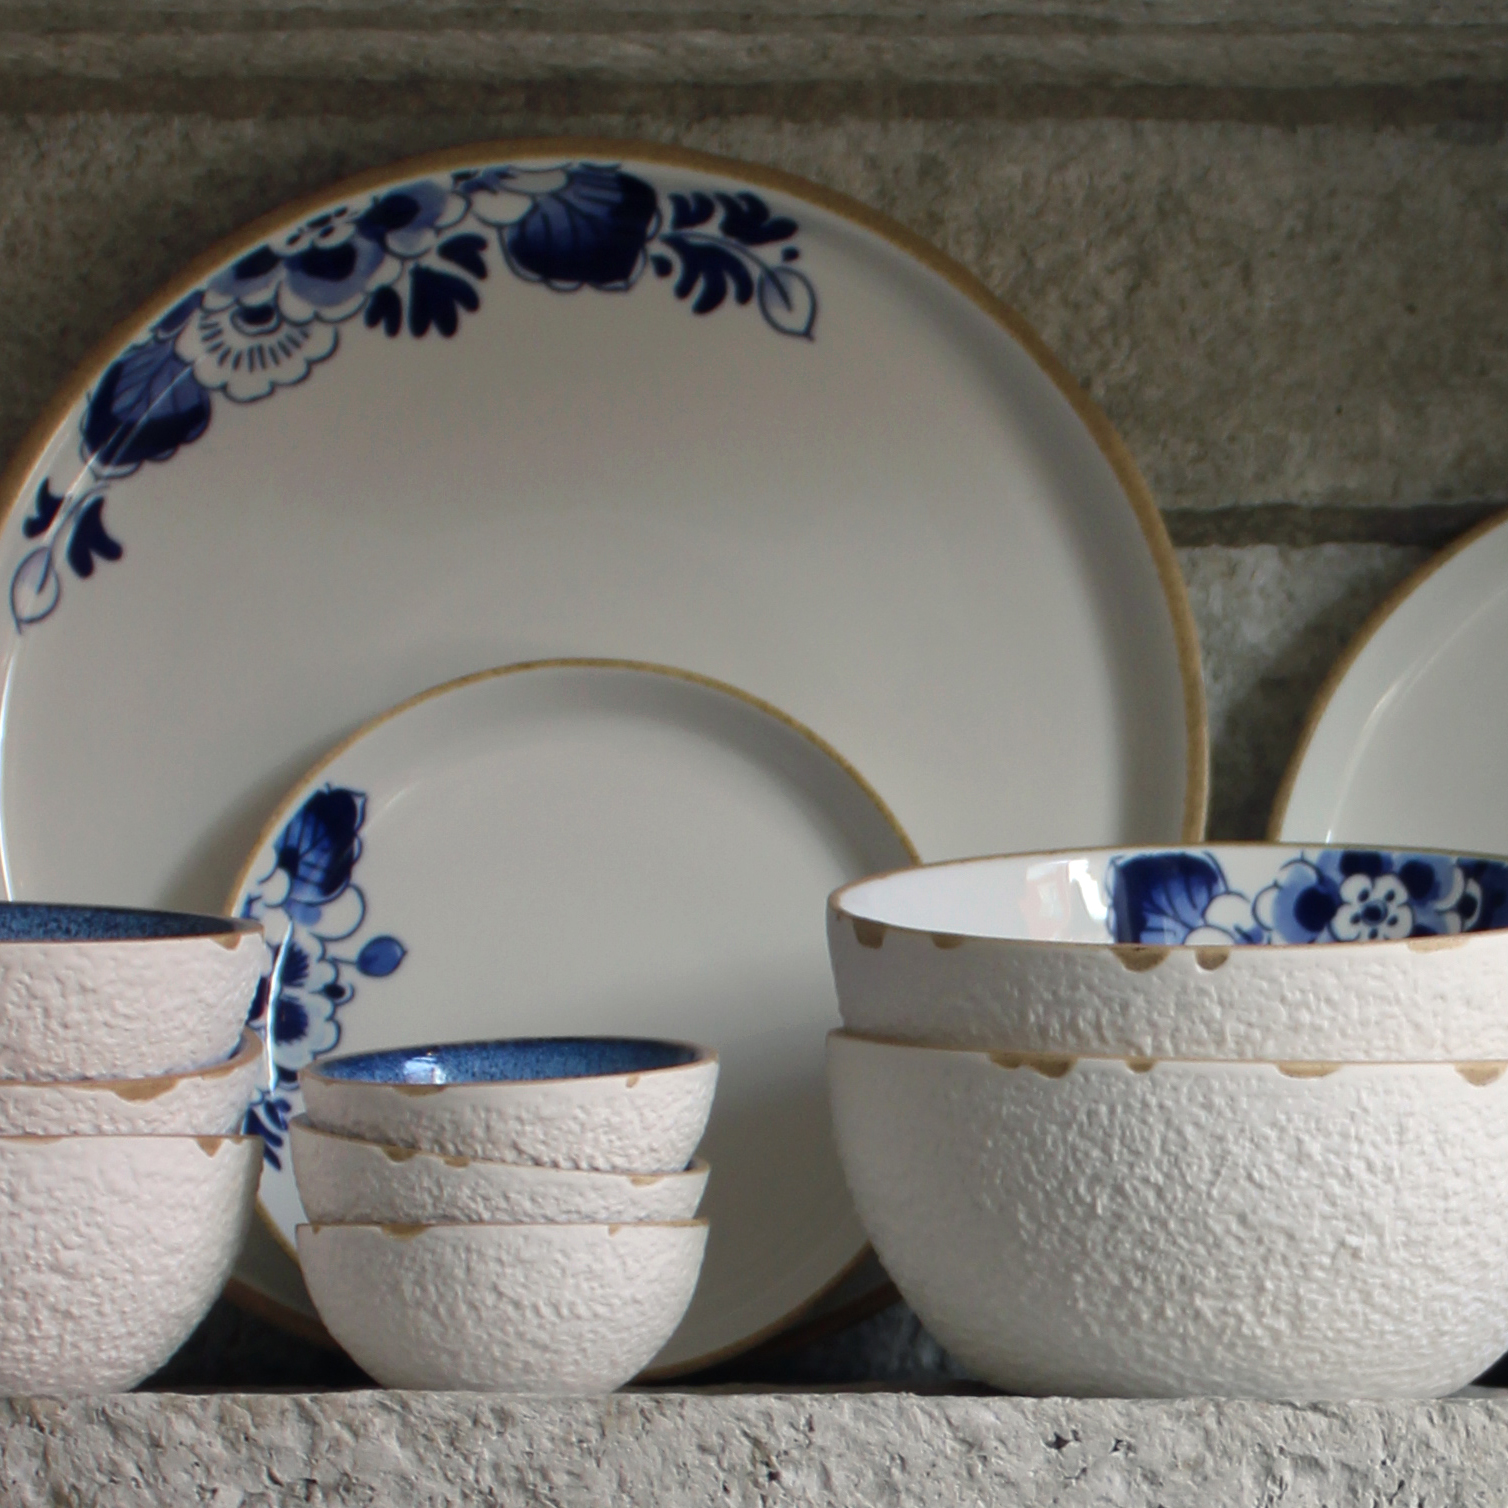 blauwbloesem_cappuccino_coffee_bowls_plates_debbiewijskamp